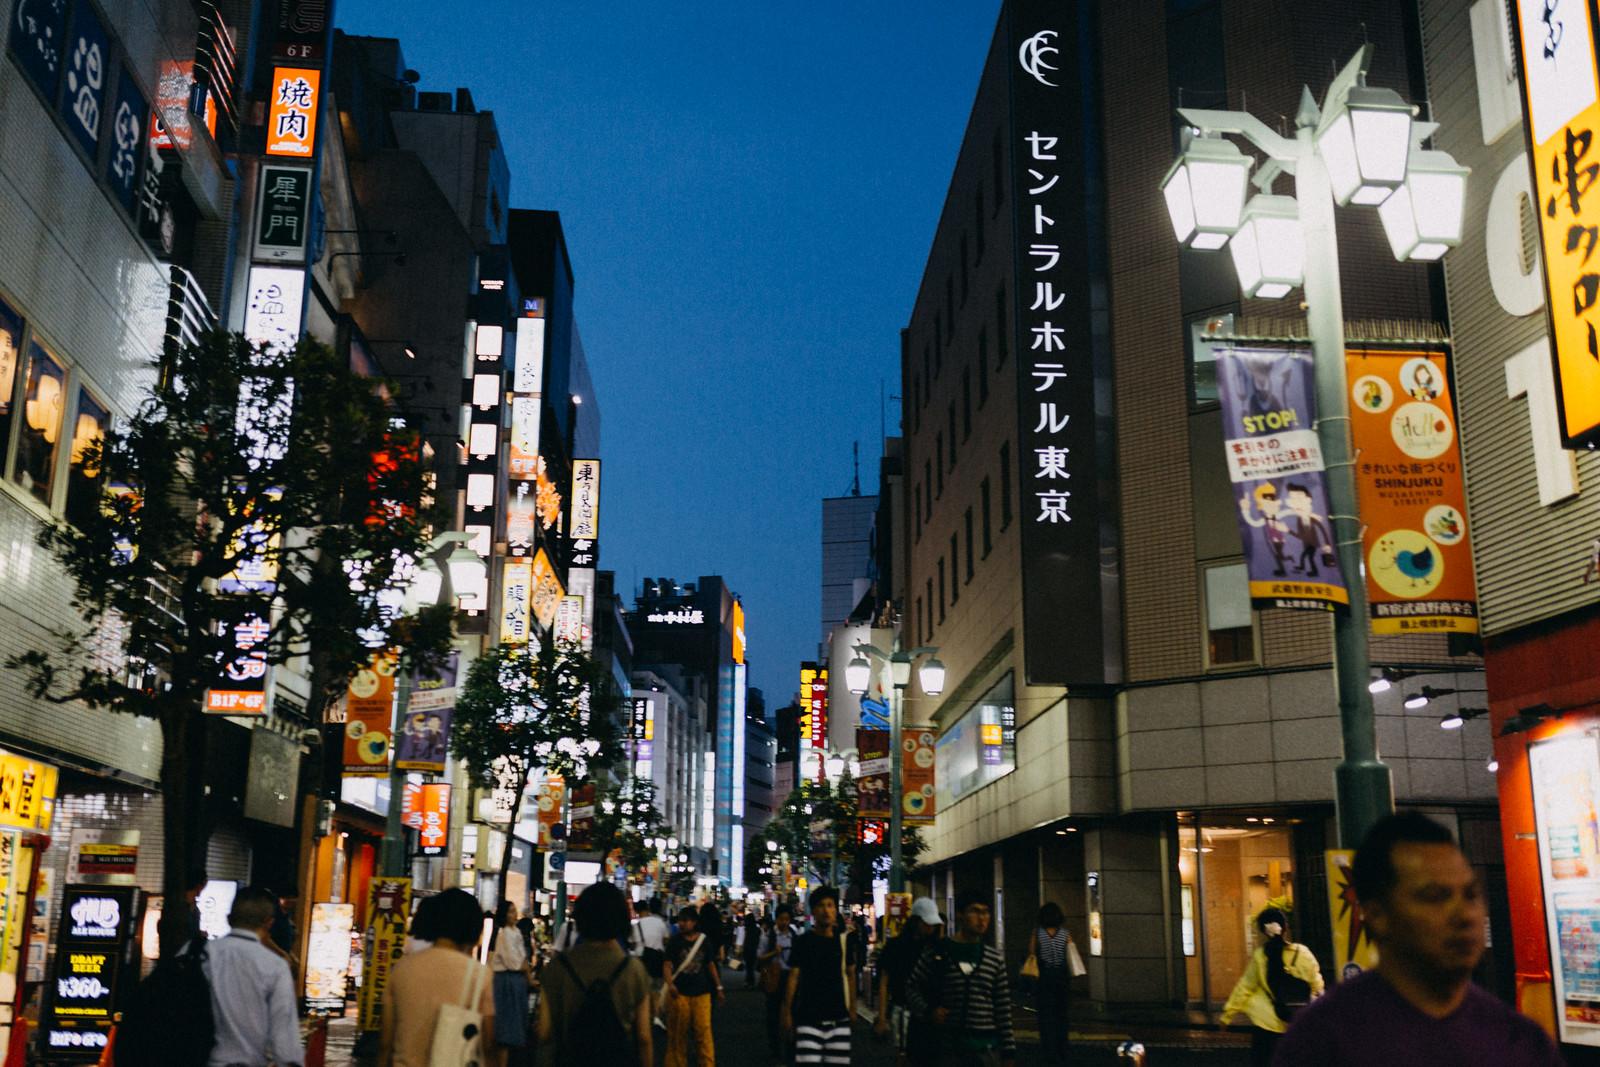 Lots of people in crowded shinjuku street experiencing night life